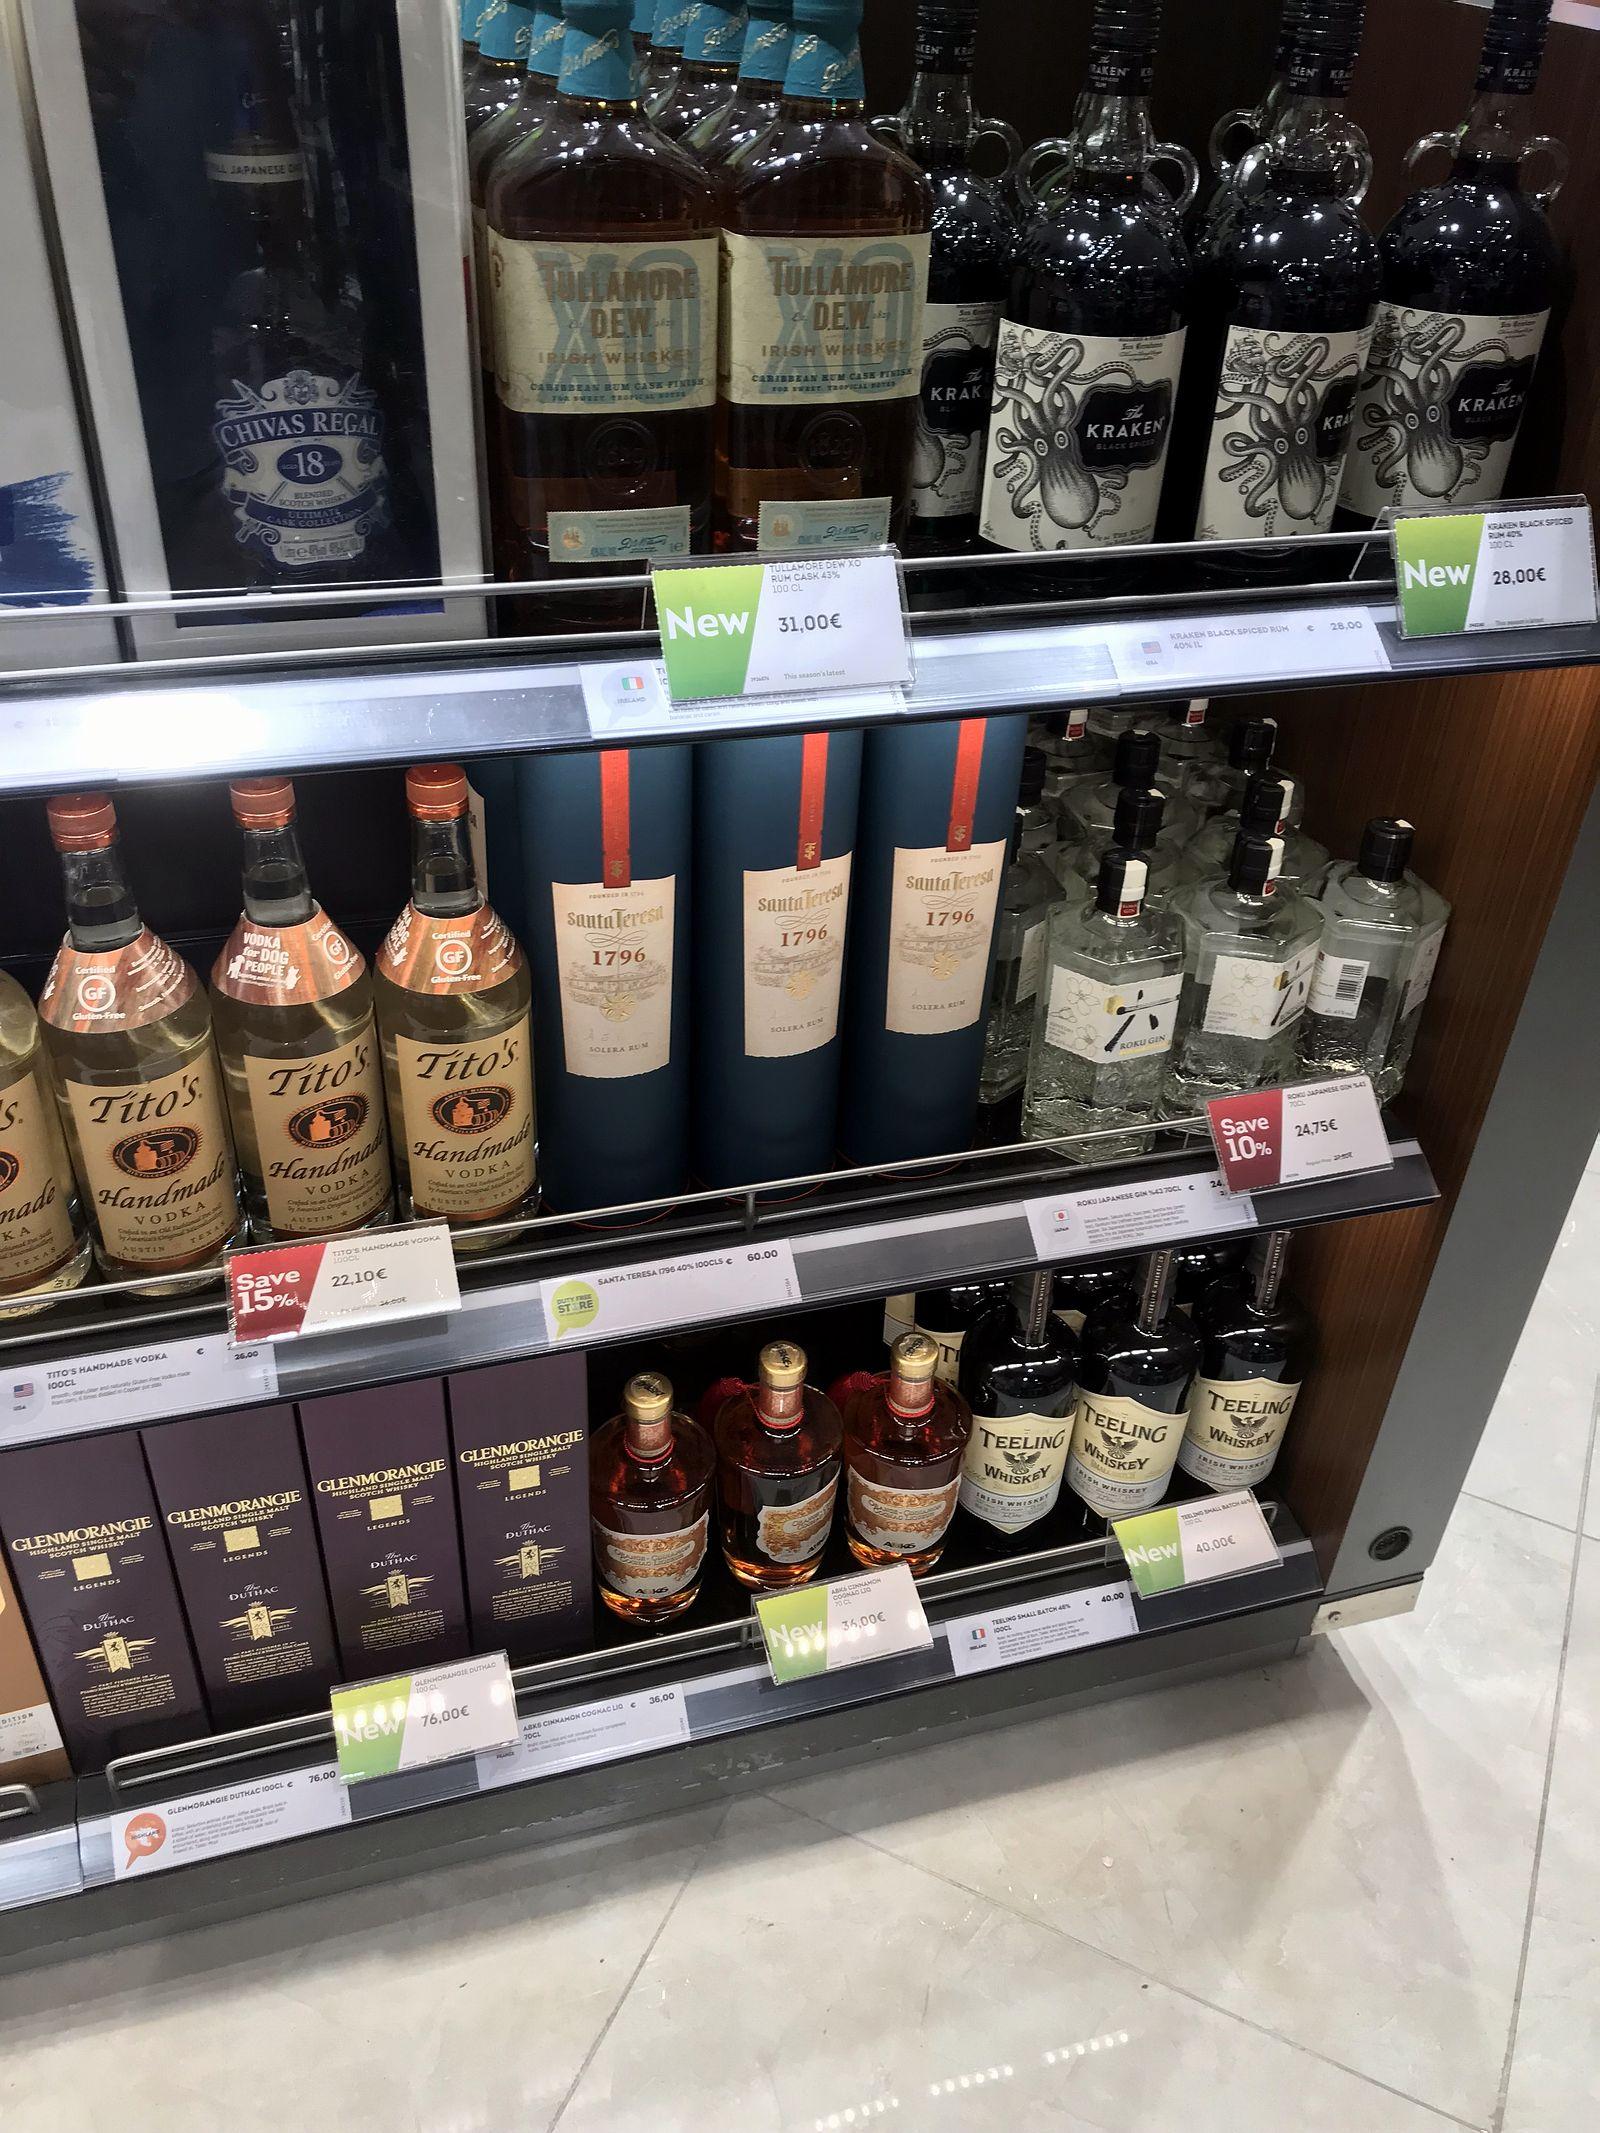 Duty free Antalya, august 2019, rum Kraken, Tito's vodka, Tullamore Dew, Santa Teresa 1796